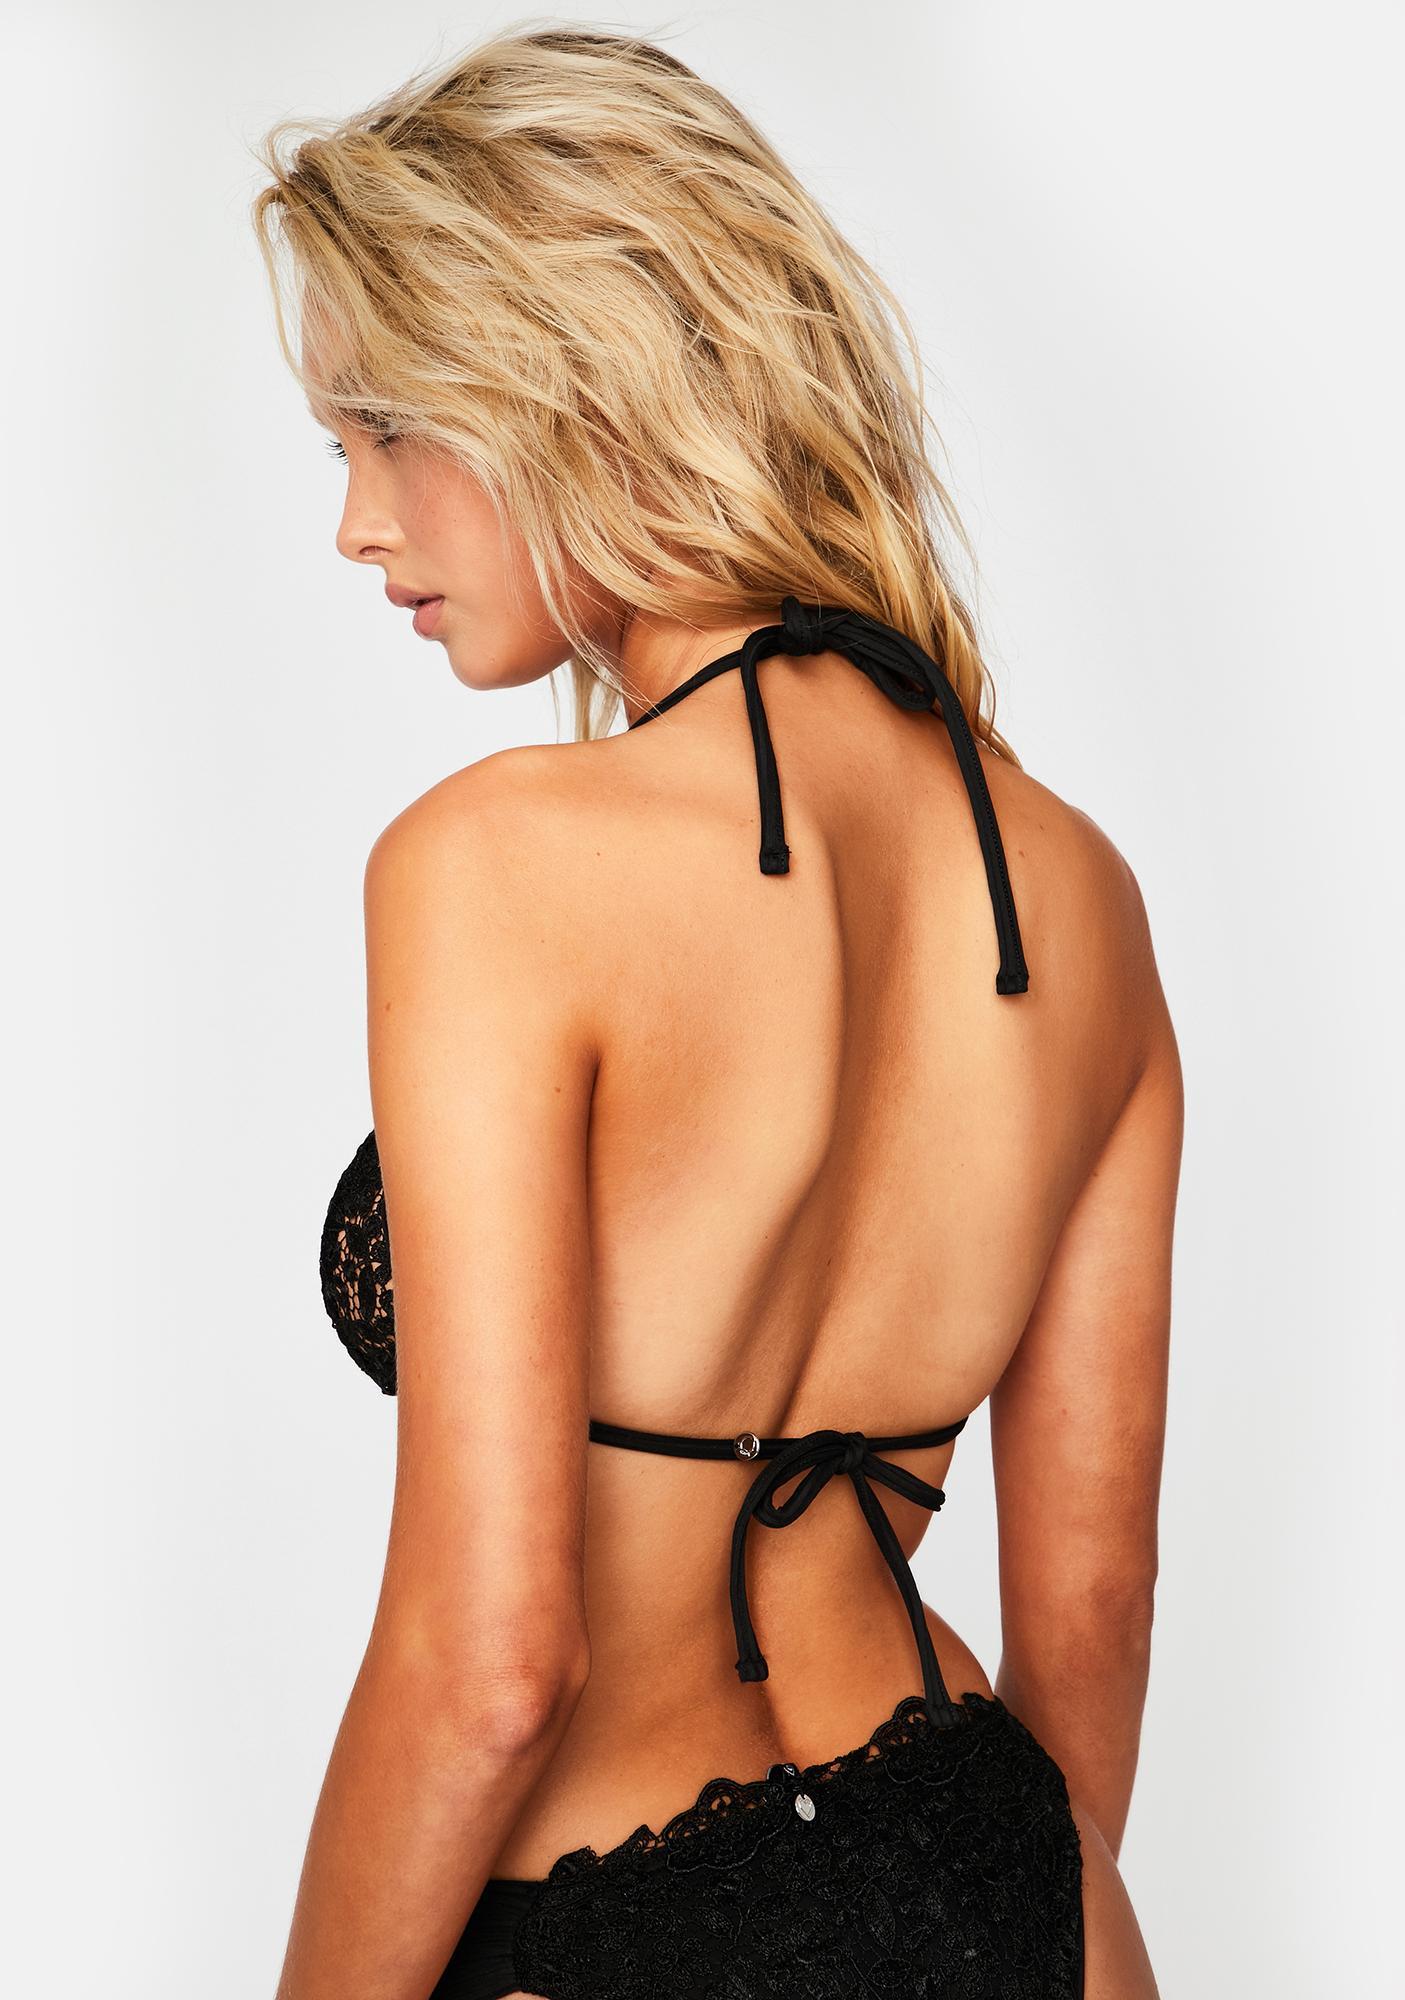 For Love & Lemons Daisy Lace Triangle Bikini Top